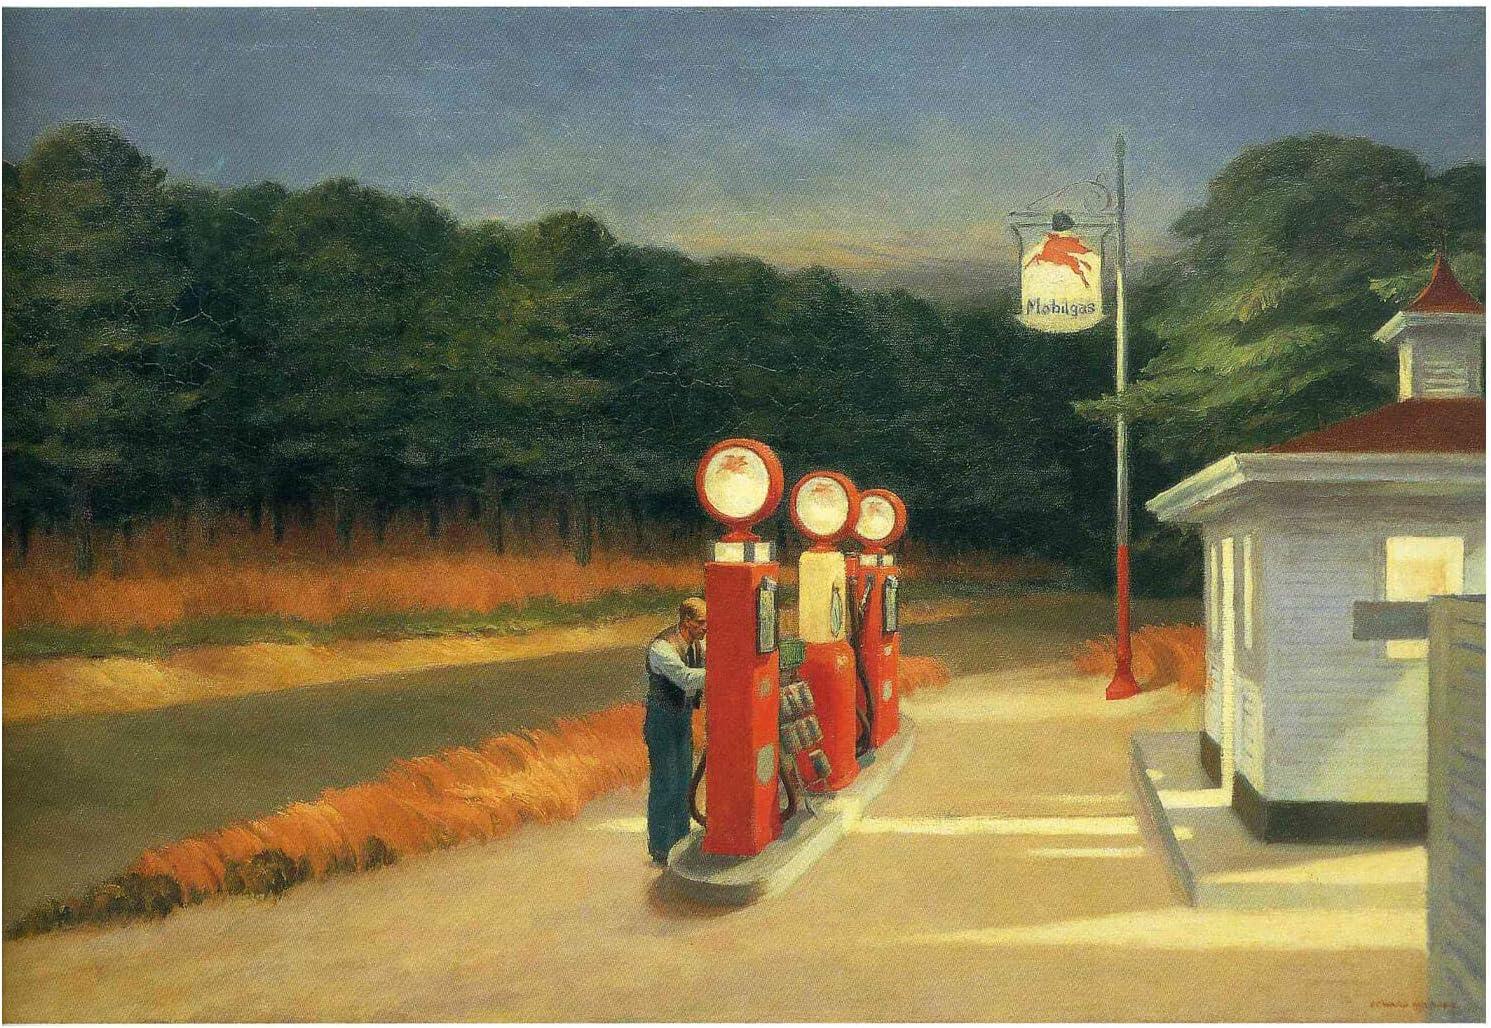 Spiffing Prints Edward Hopper - Gas - Medium - Matte - Unframed